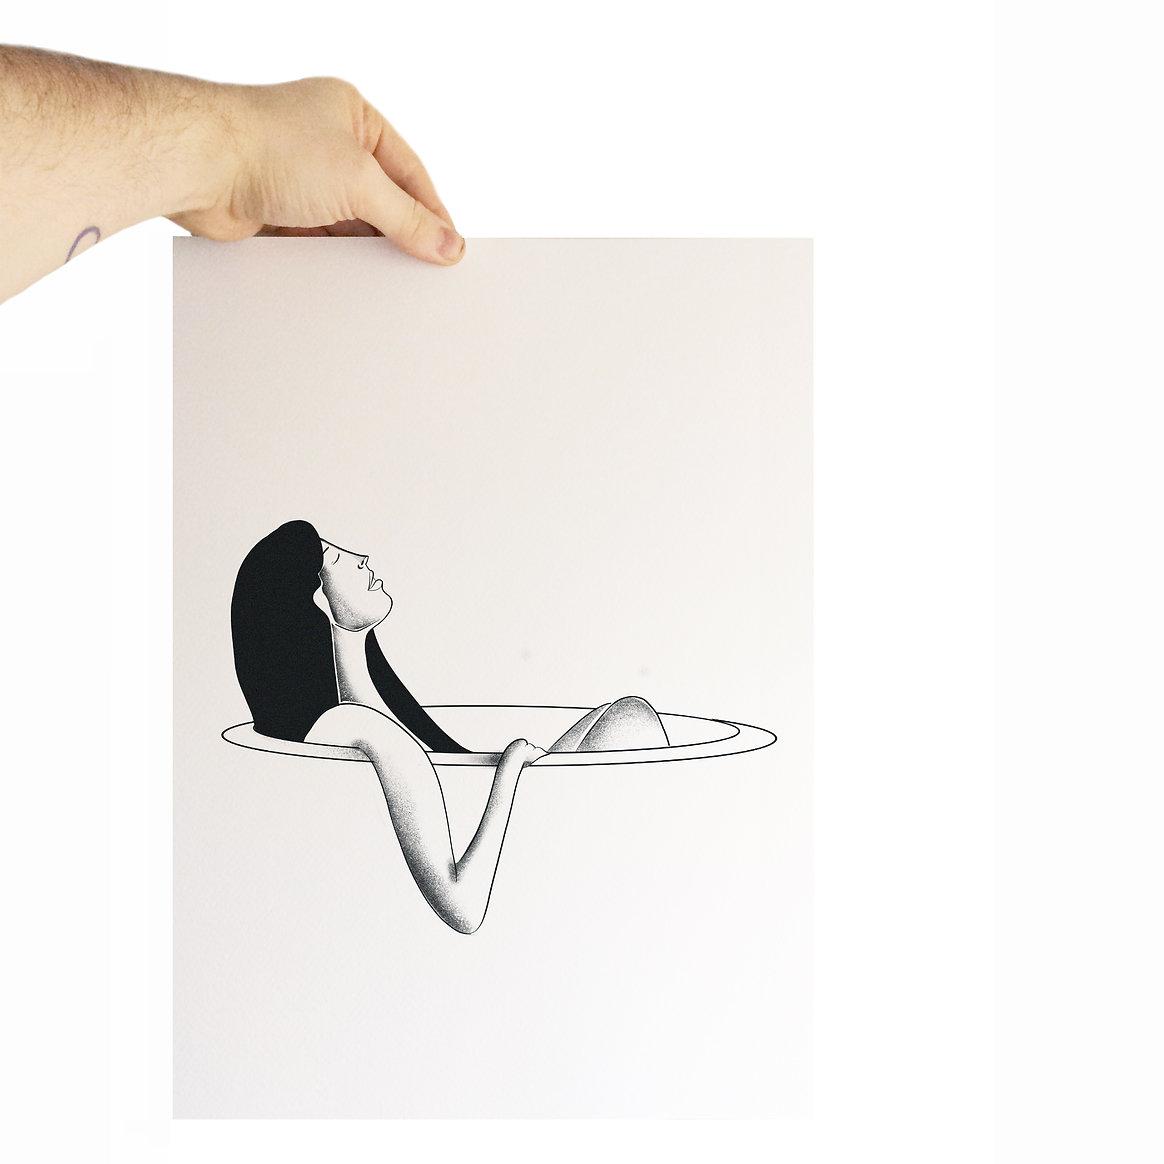 woman-in-bath-etsy-square.jpg